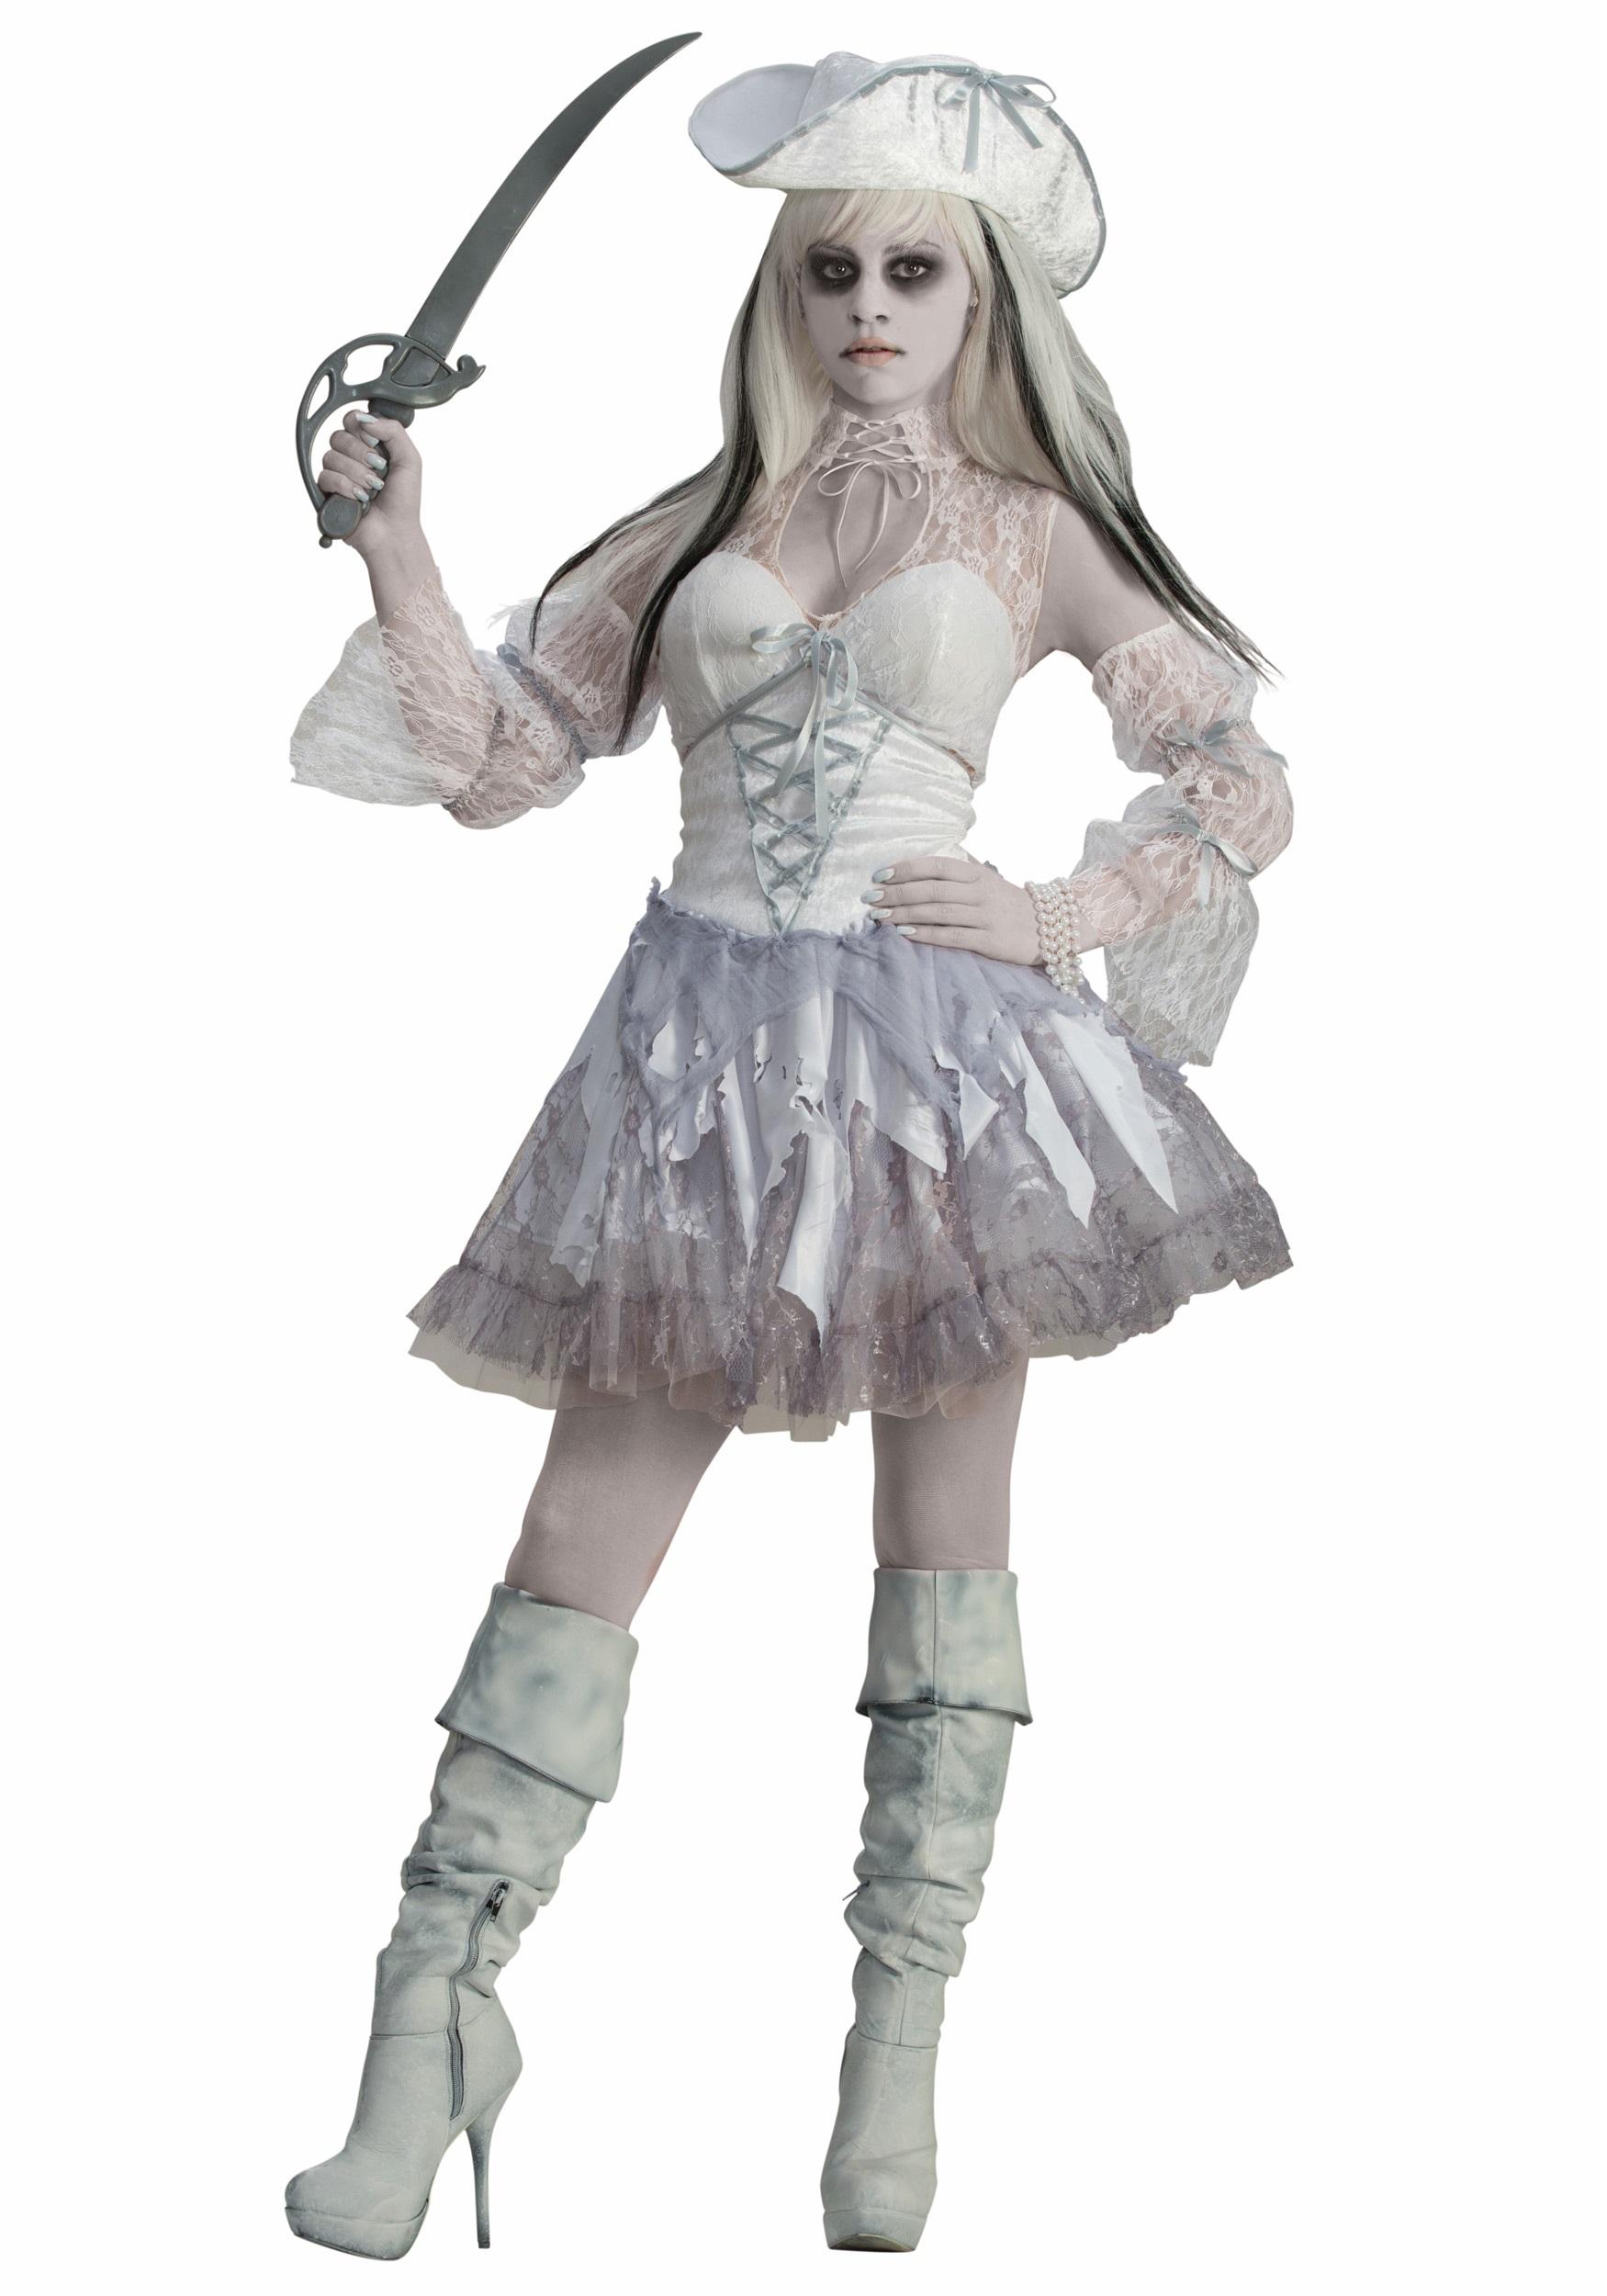 Womenu0027s Spirit of the Seas Ghost Pirate Costume  sc 1 st  Halloween Costumes & Womenu0027s Spirit of the Seas Ghost Pirate Costume - Halloween Costumes